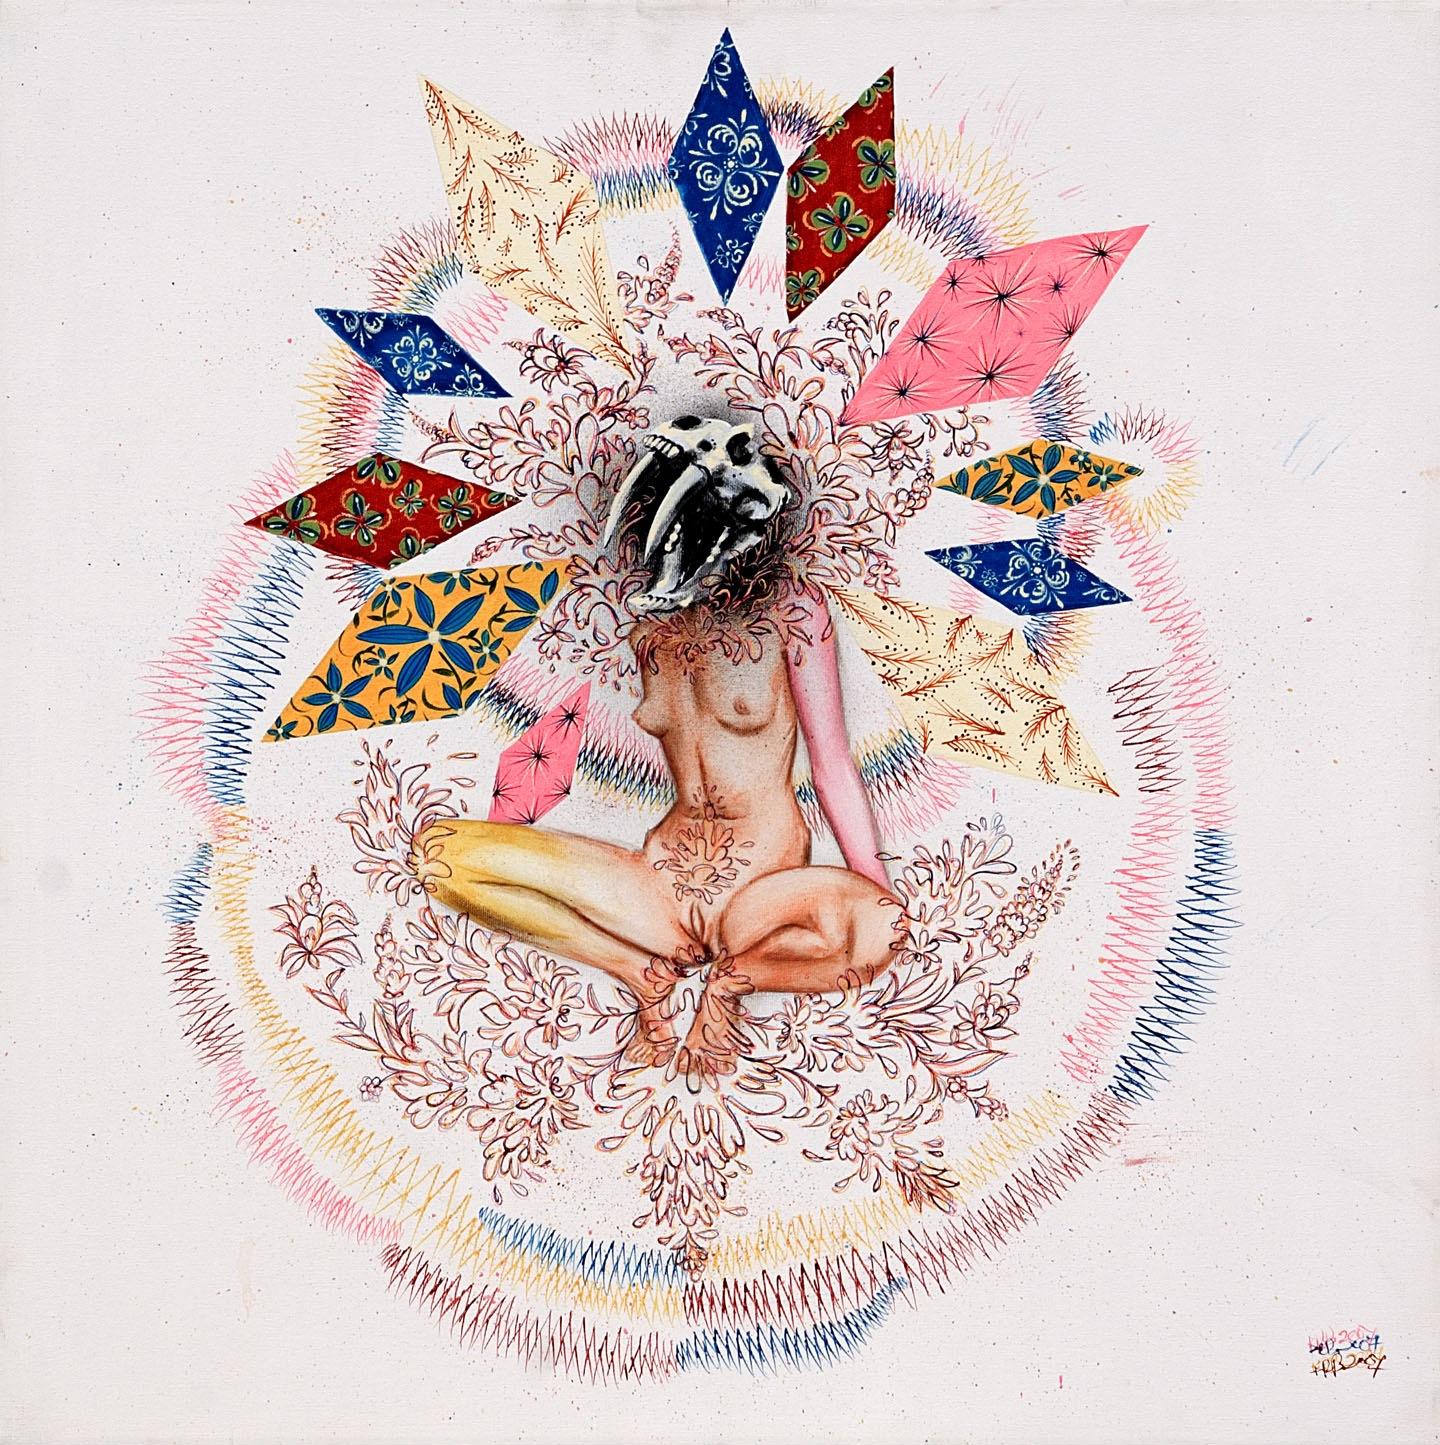 art blog - Kelsey Brookes - empty kingdom